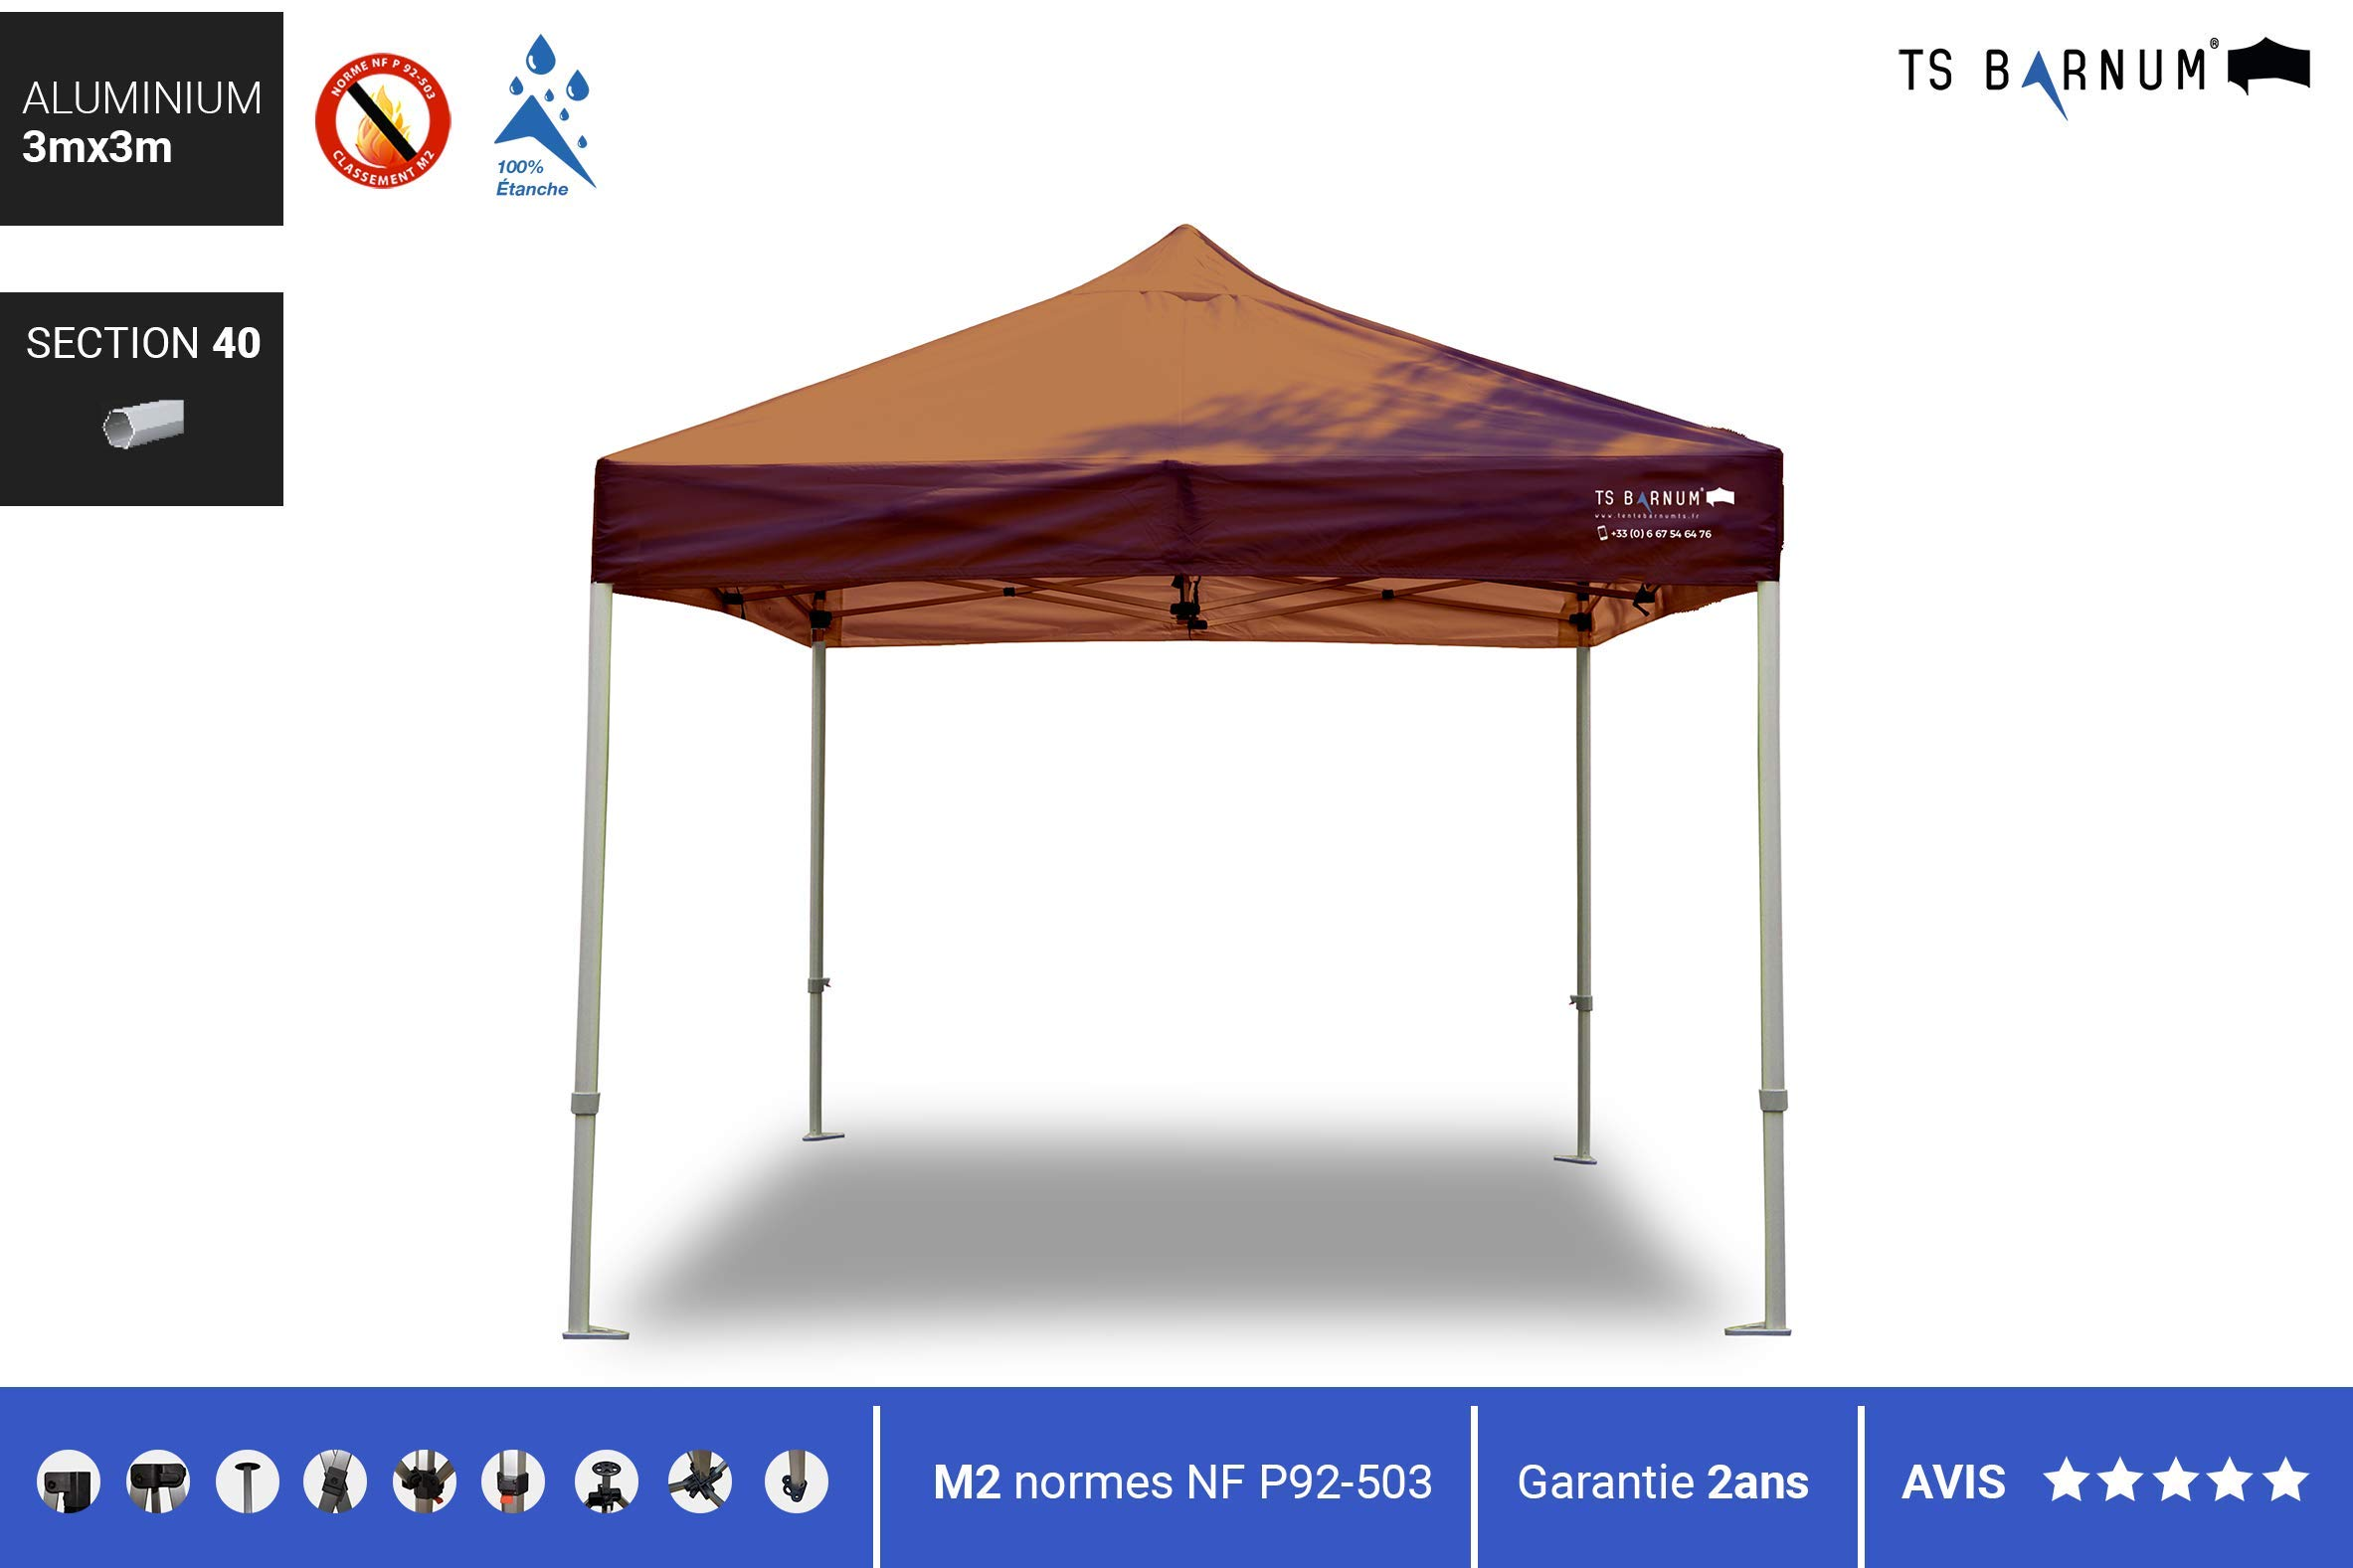 Barnum Aluminio # 40, Color marrón, tamaño 3m x 3m (M2), 97.00 ...